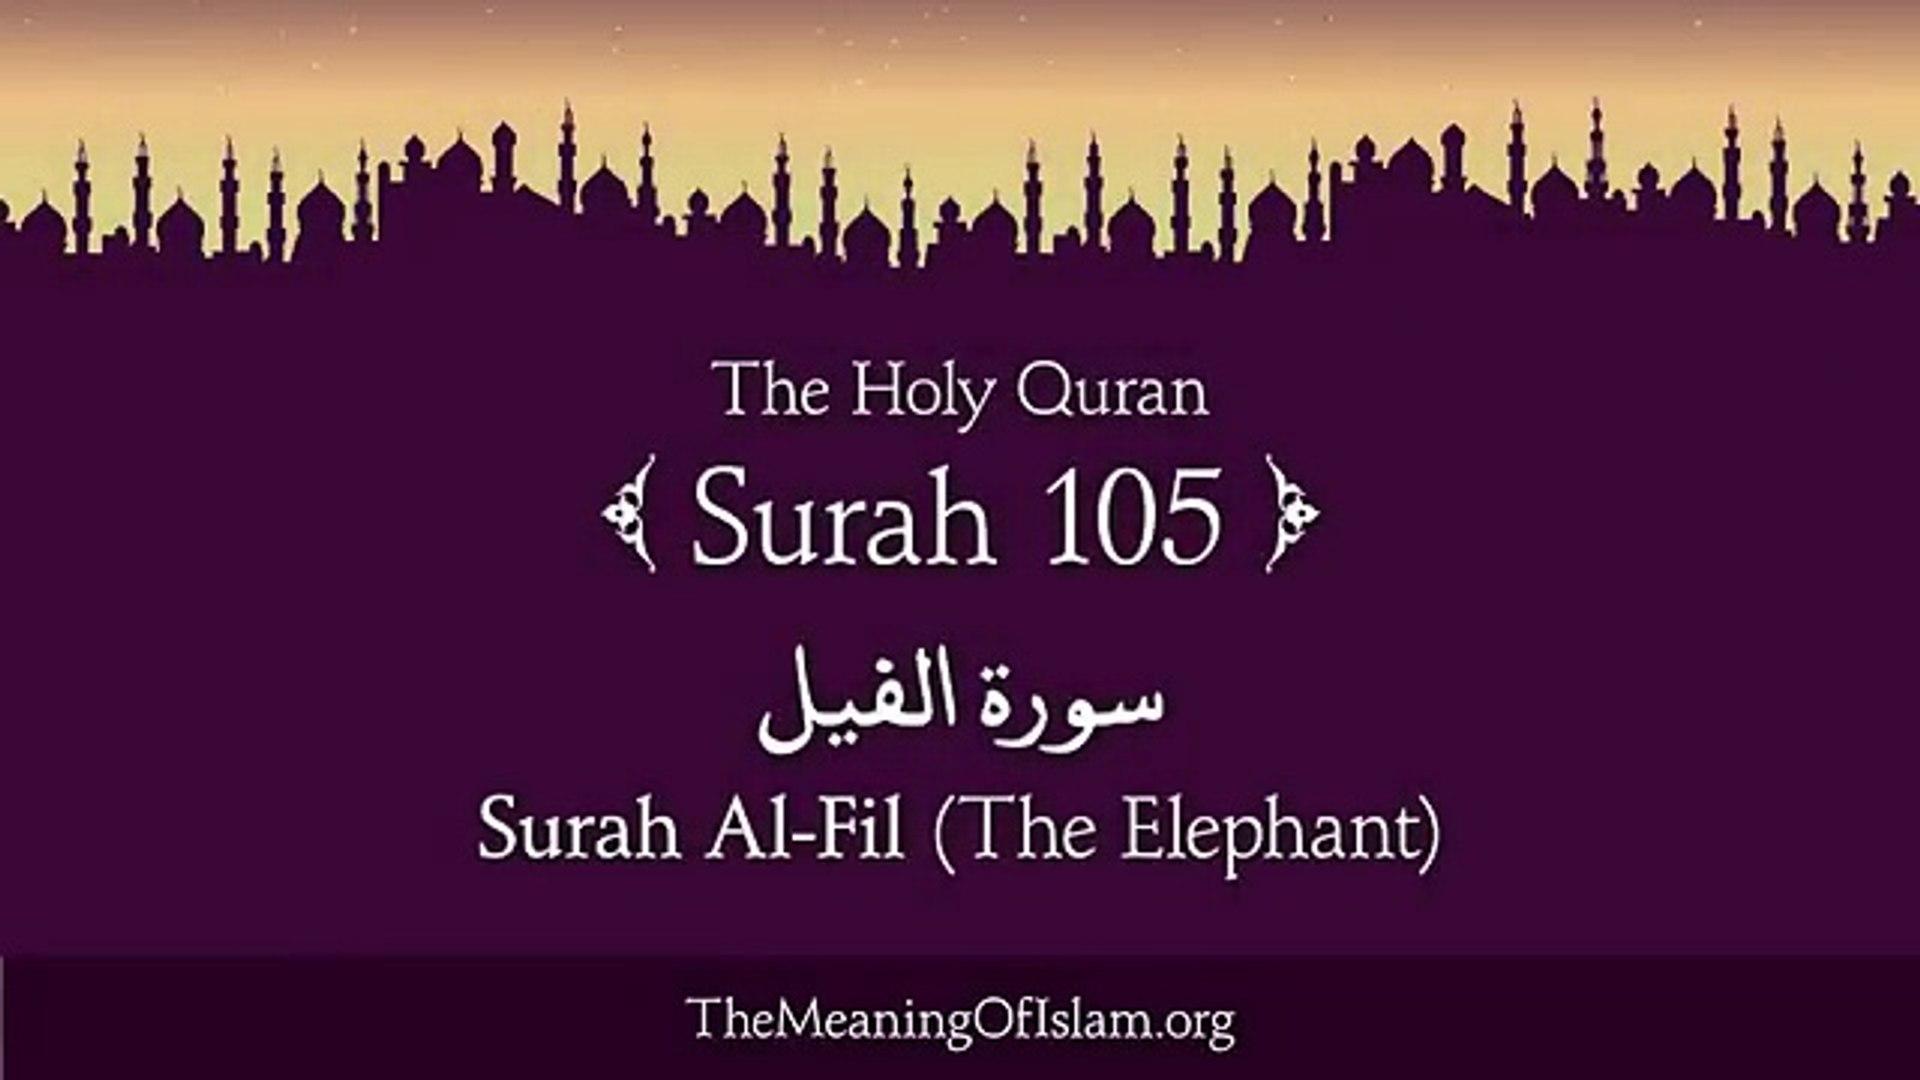 Quran 105 Surah Al Fil The Elephant Arabic And English Translation Hd